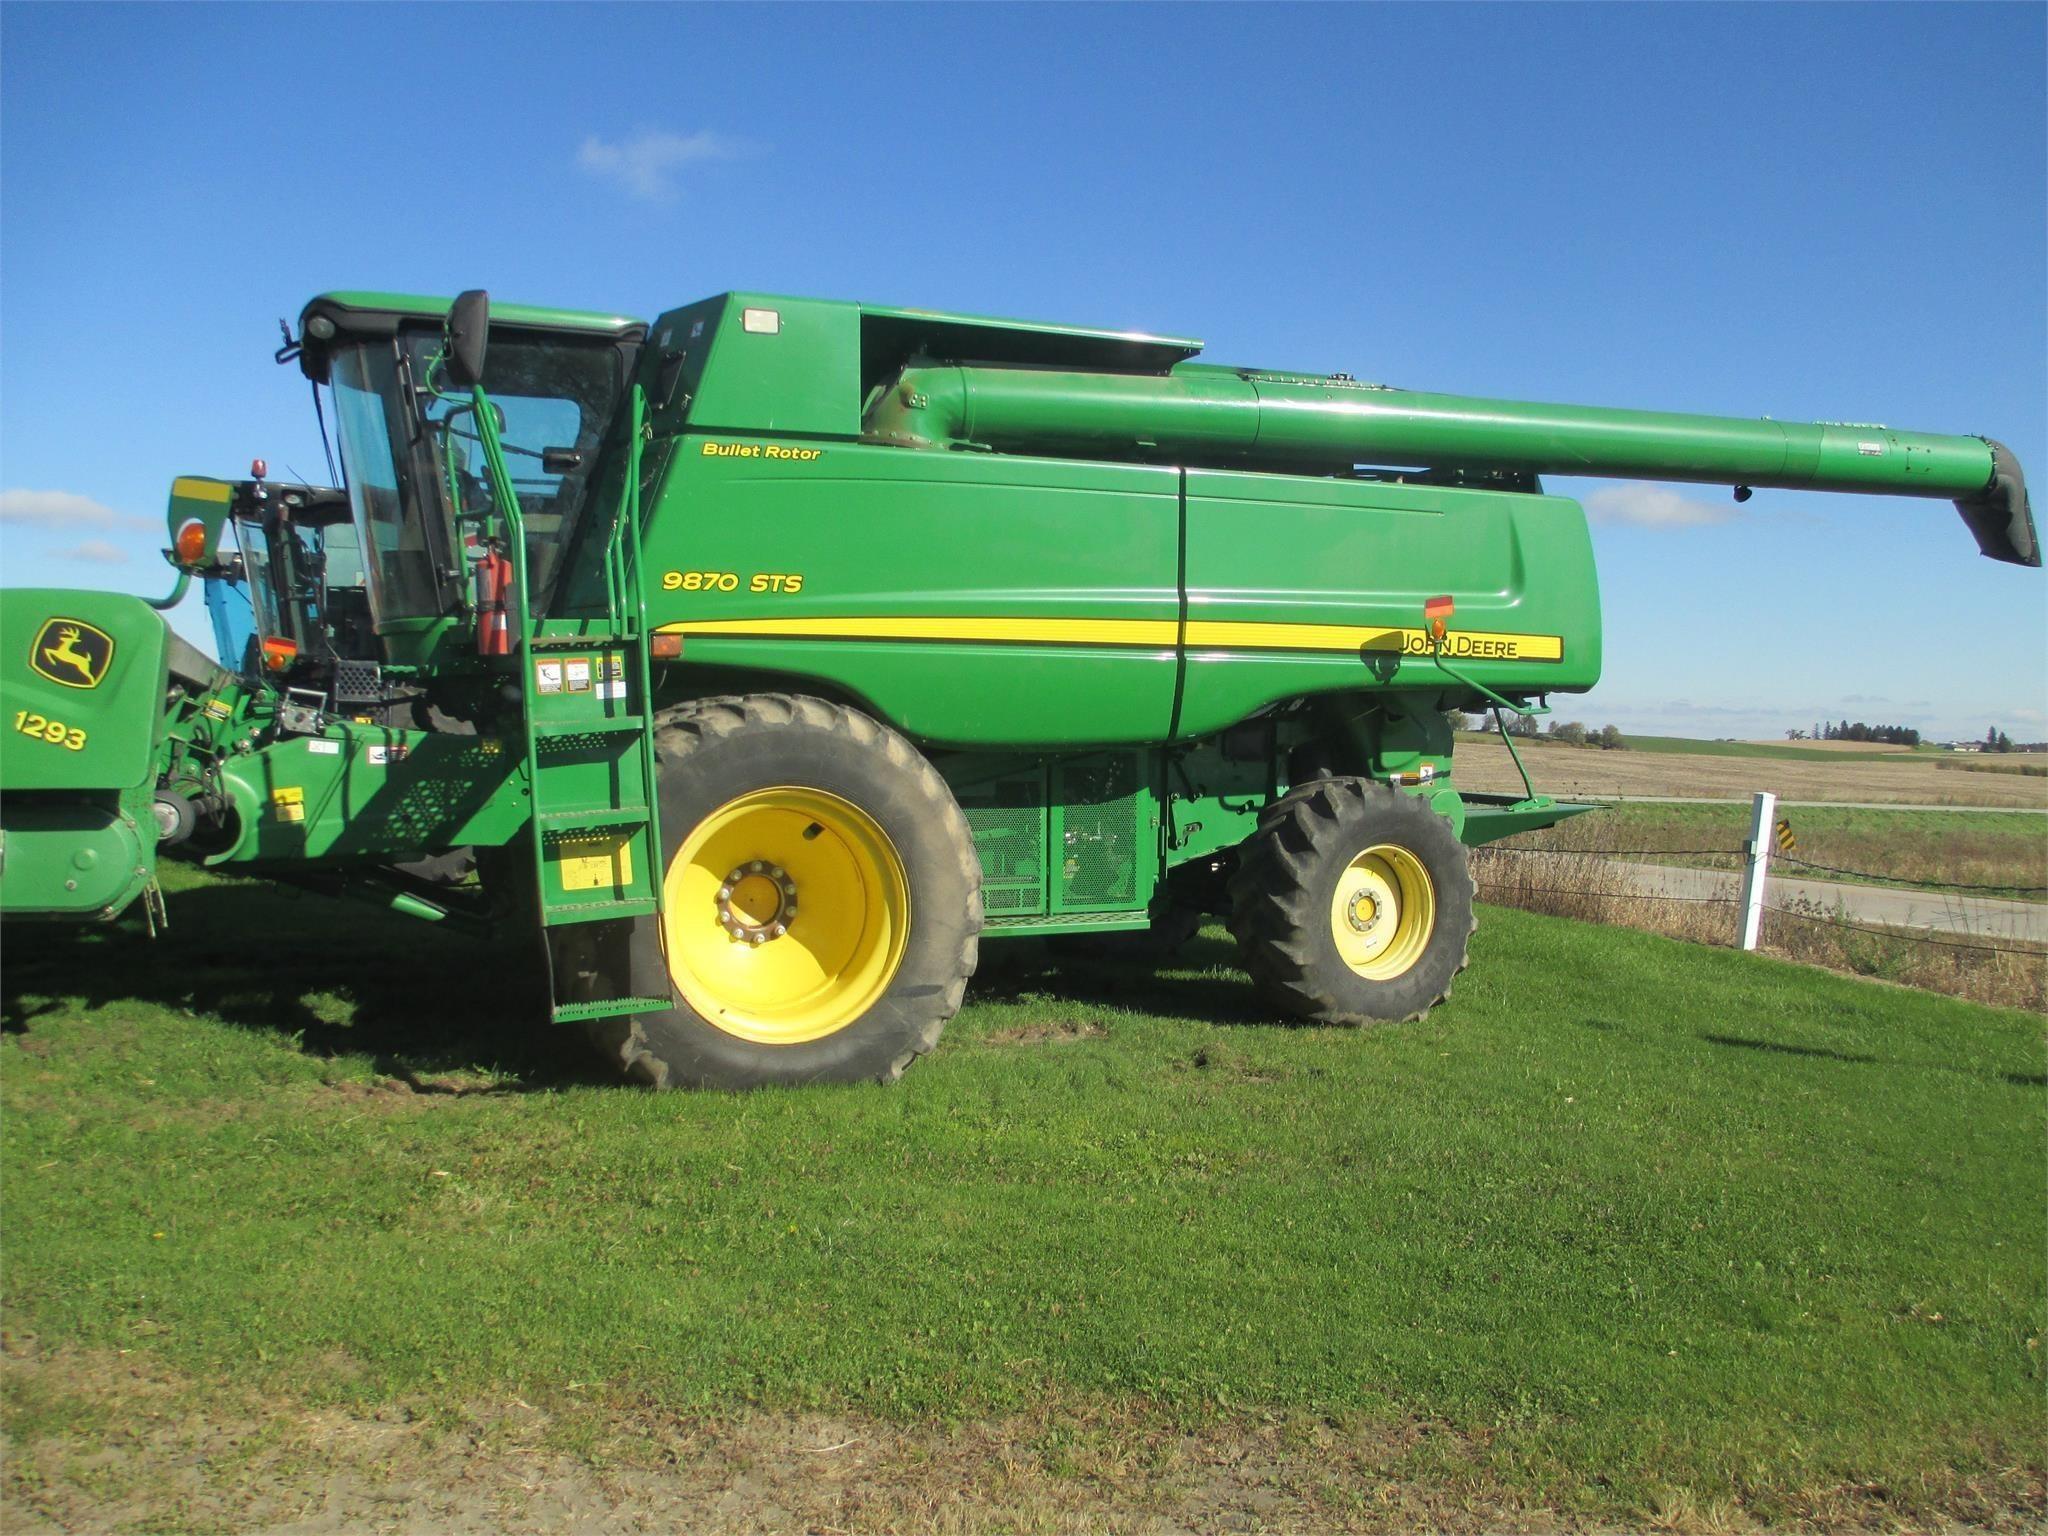 Used, 2009, JOHN DEERE, 9870 STS, Harvesters - Combines